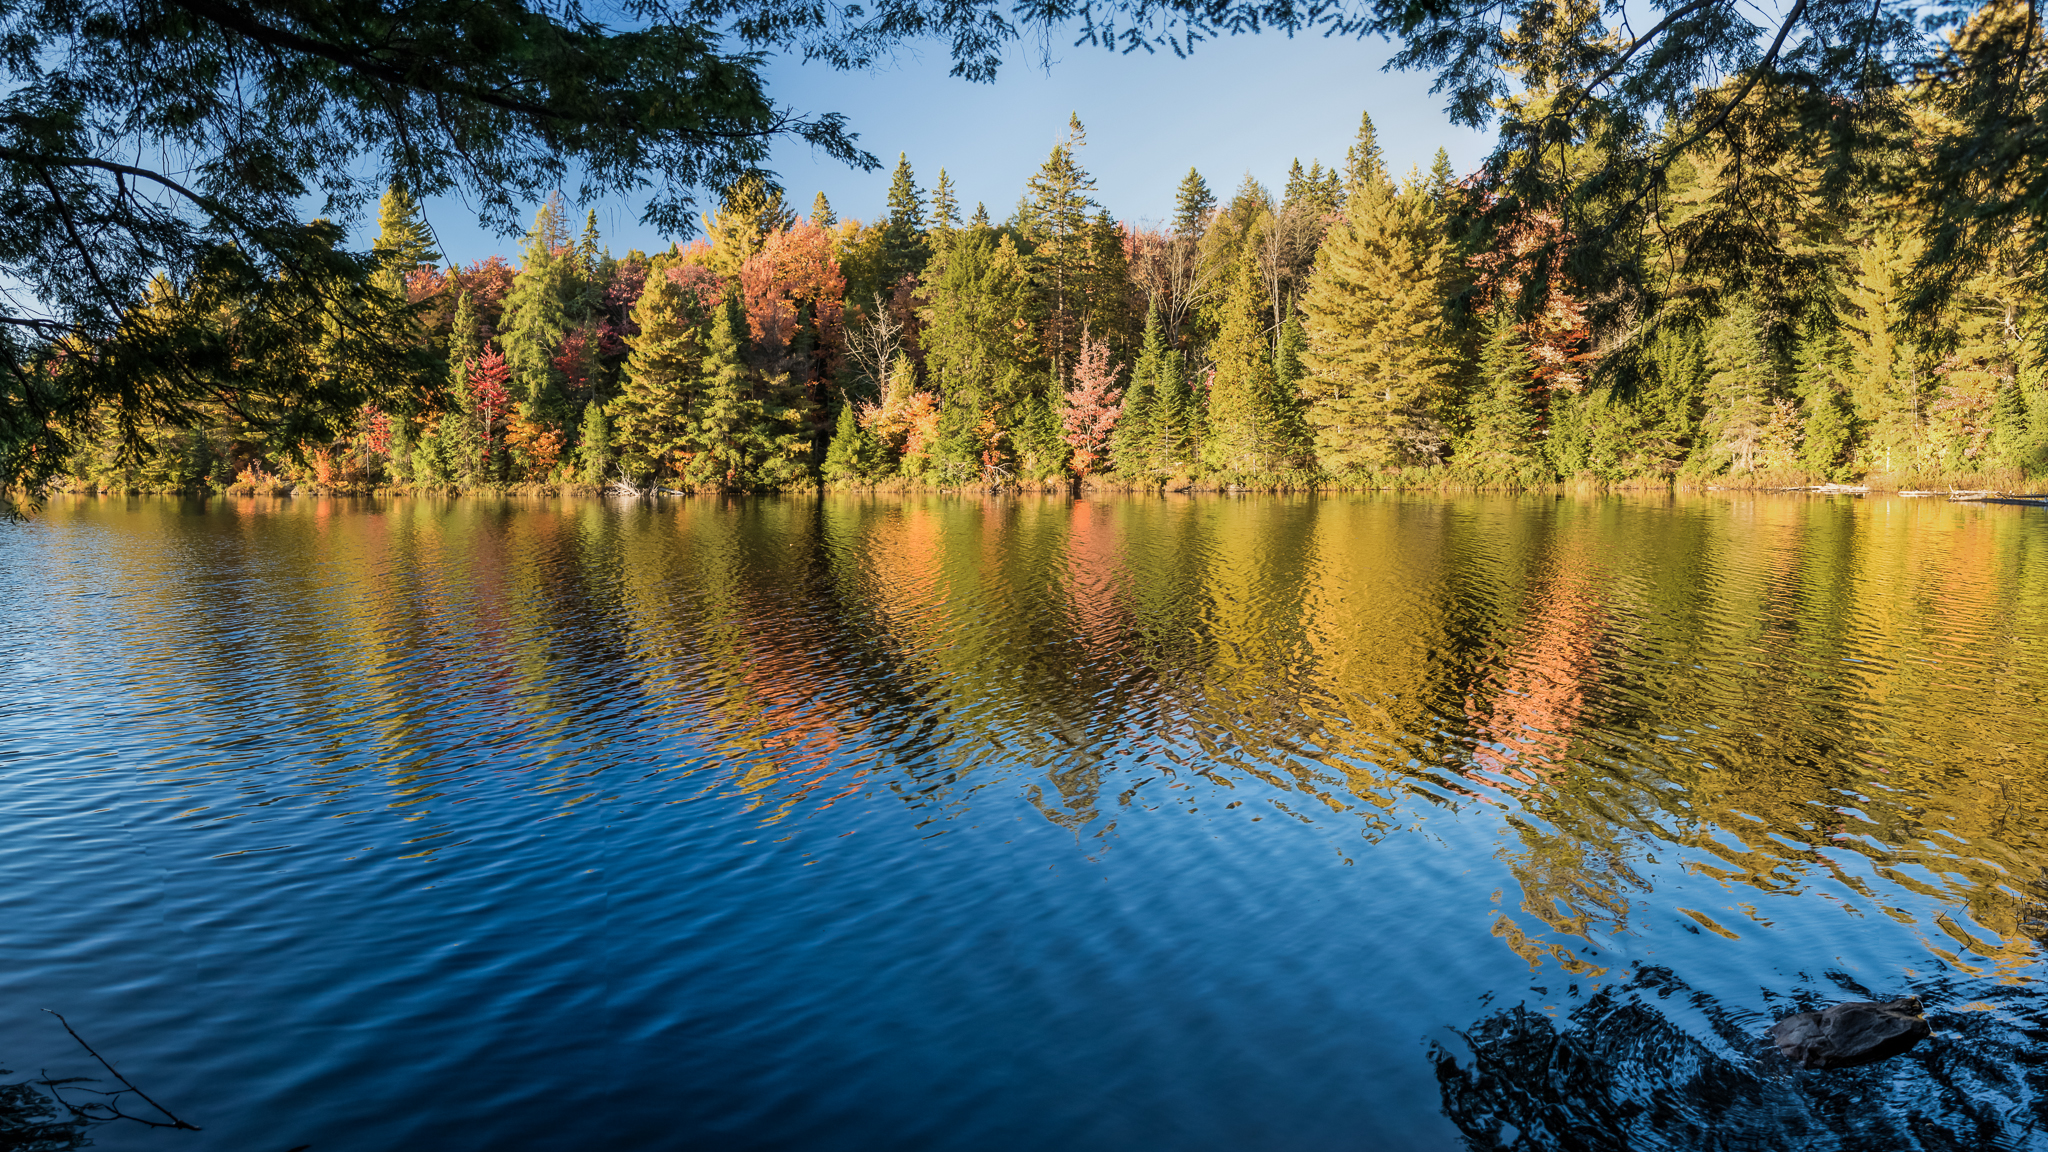 Peck Lake (1/80s, f/6.3, ISO400 - 7 shot panorama)